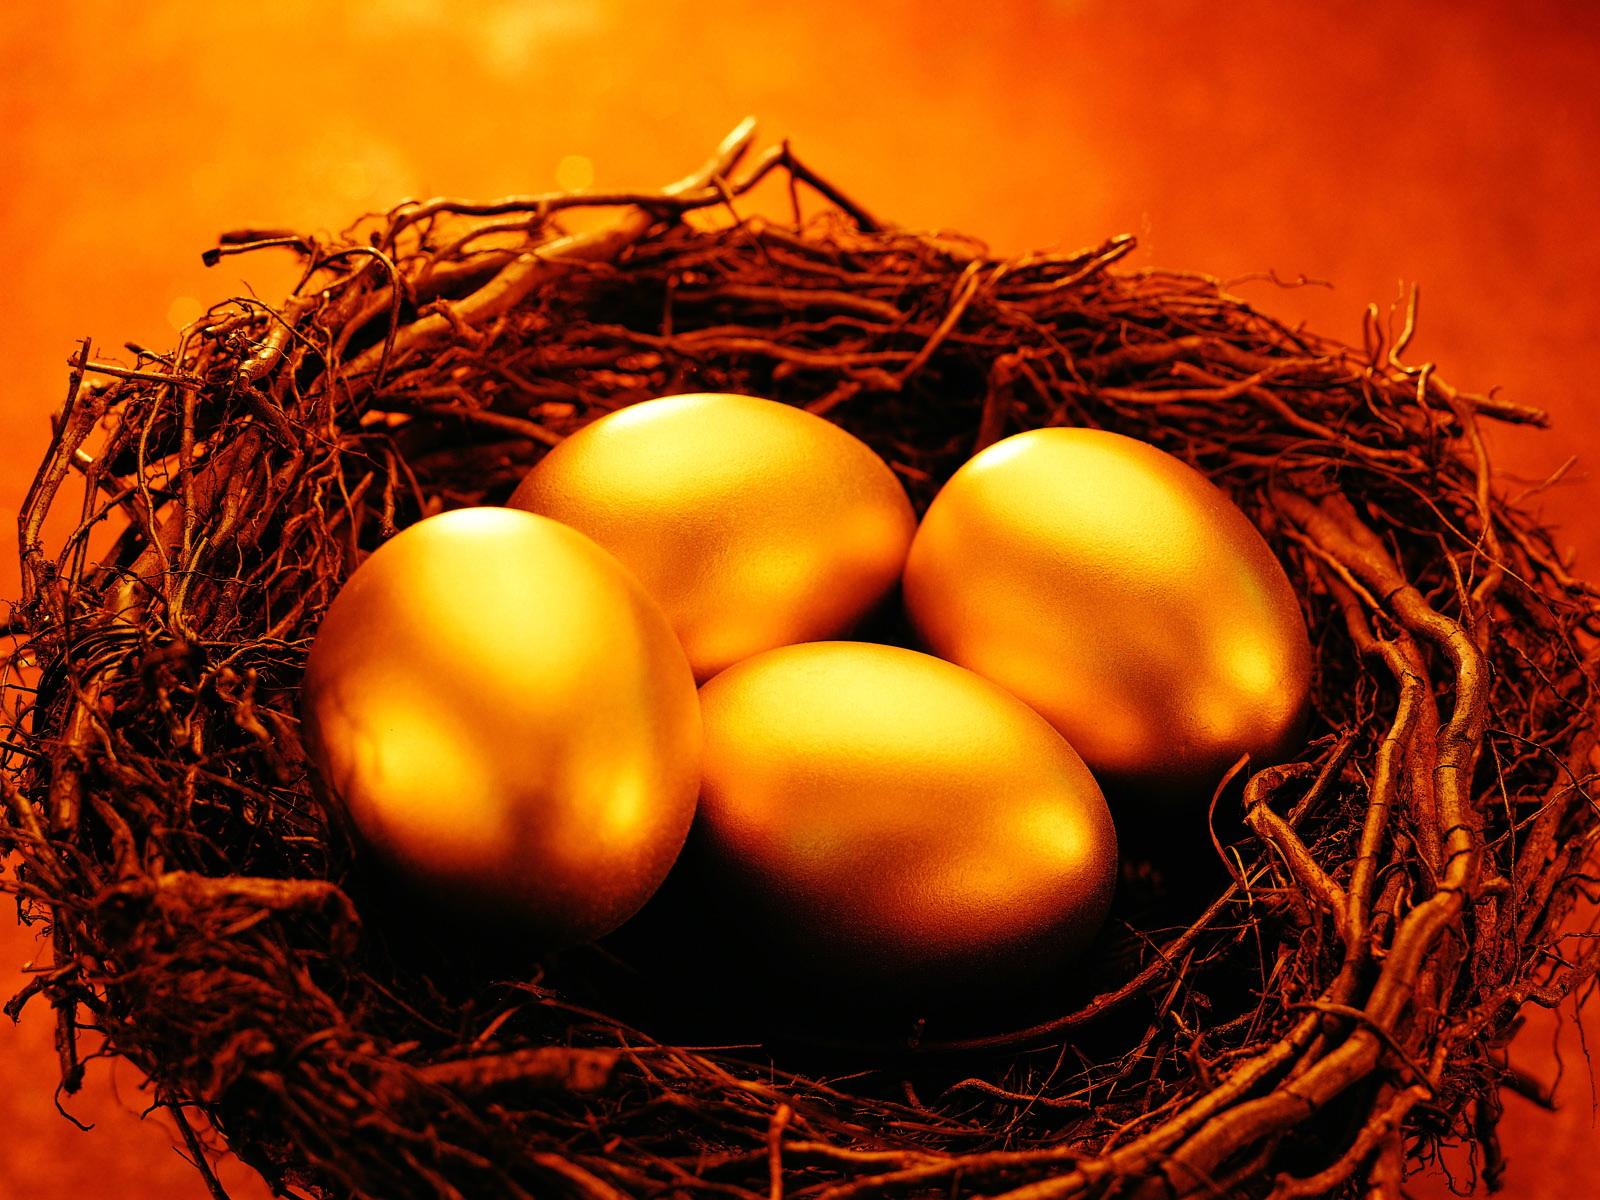 Gold eggs